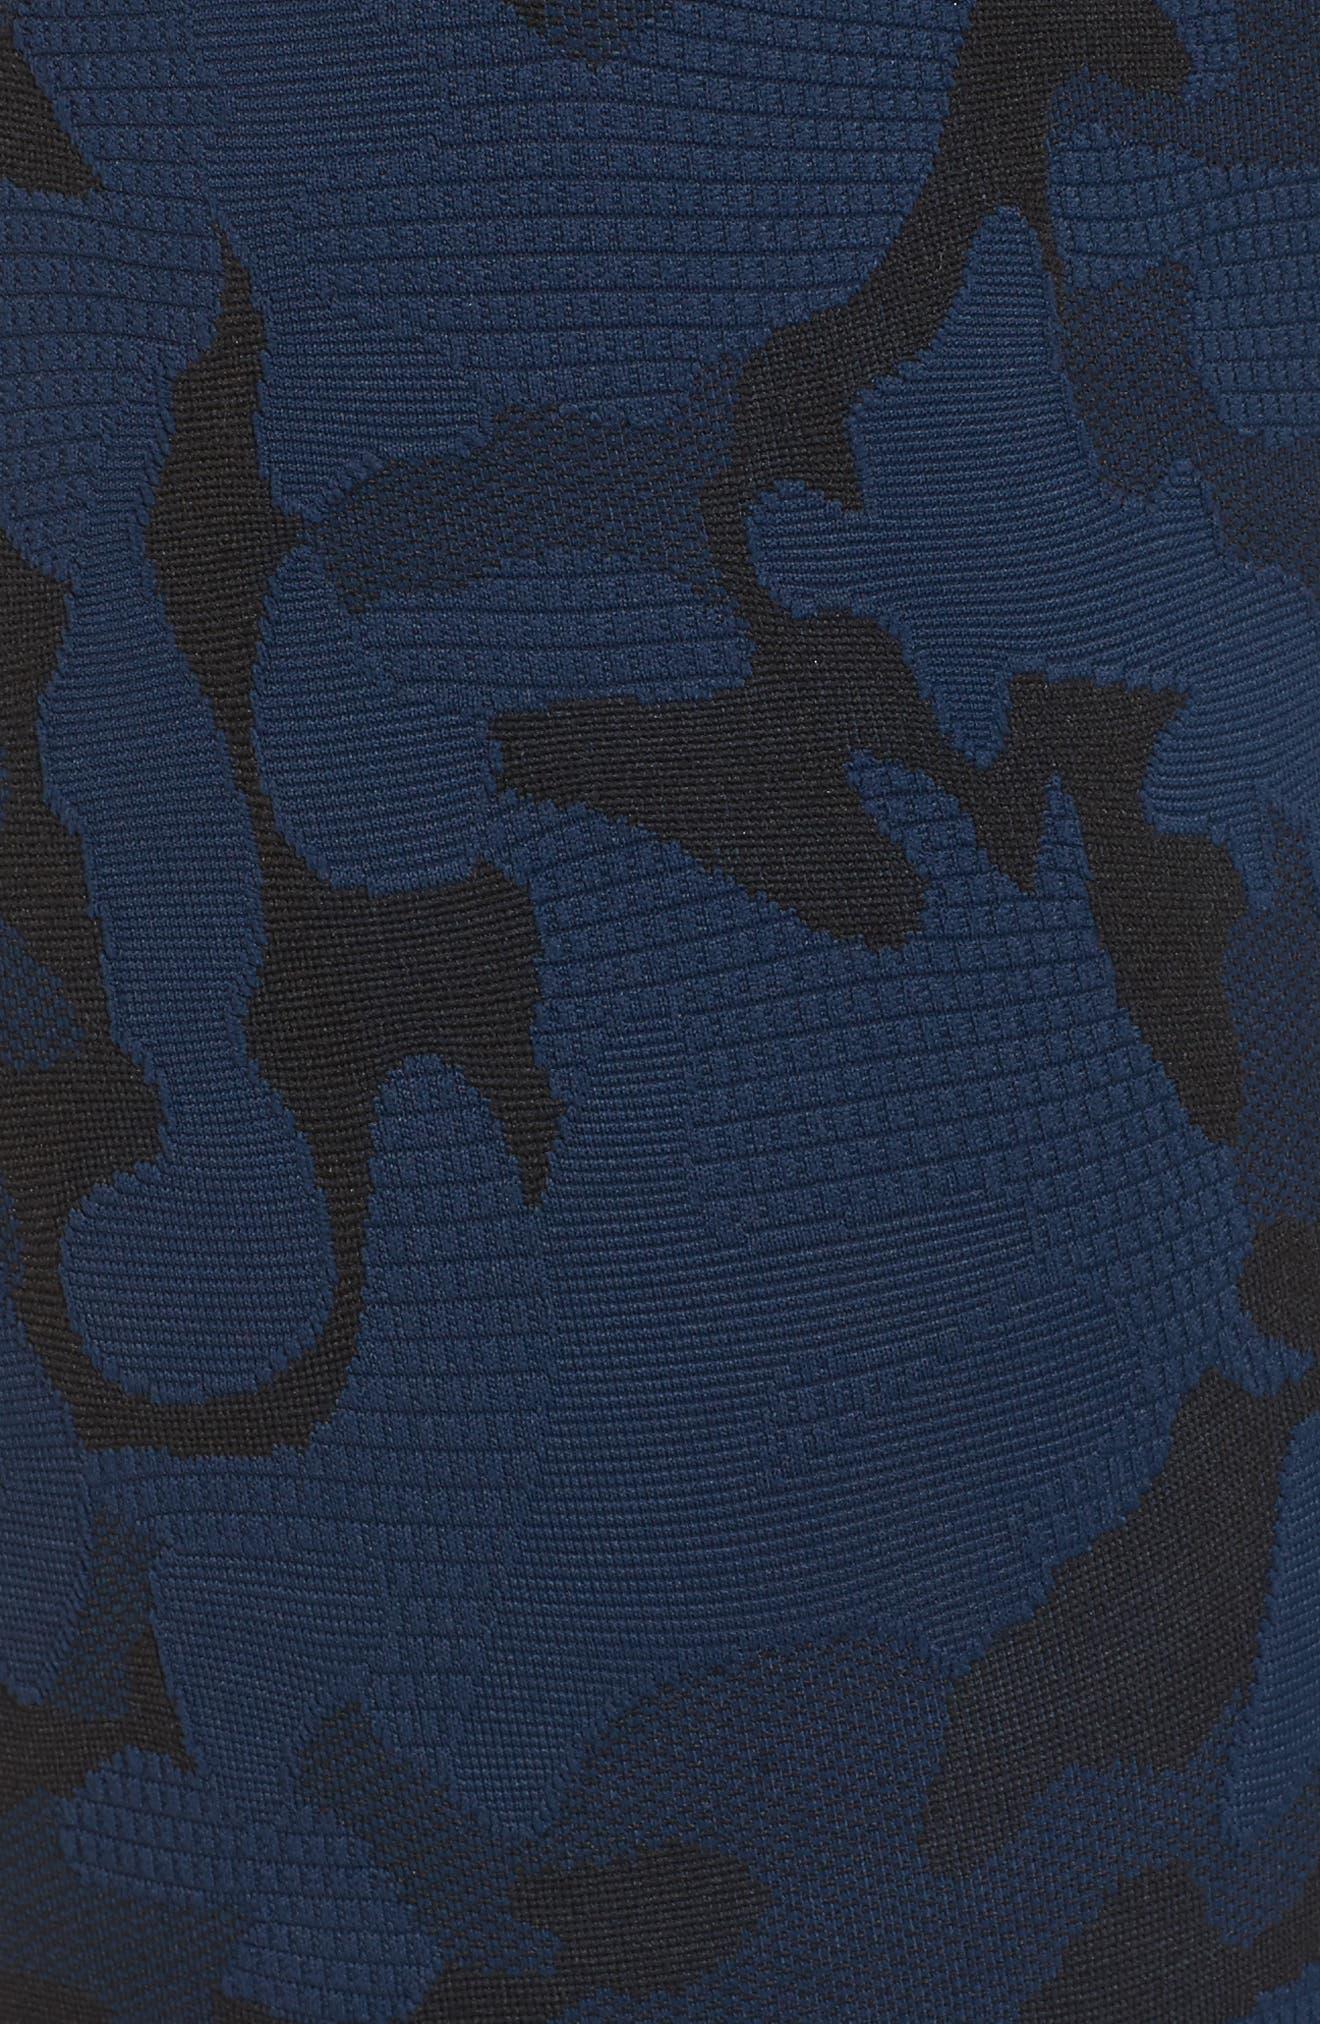 Knockout Camo Crop Leggings,                             Alternate thumbnail 6, color,                             Midnight Blue/ Black